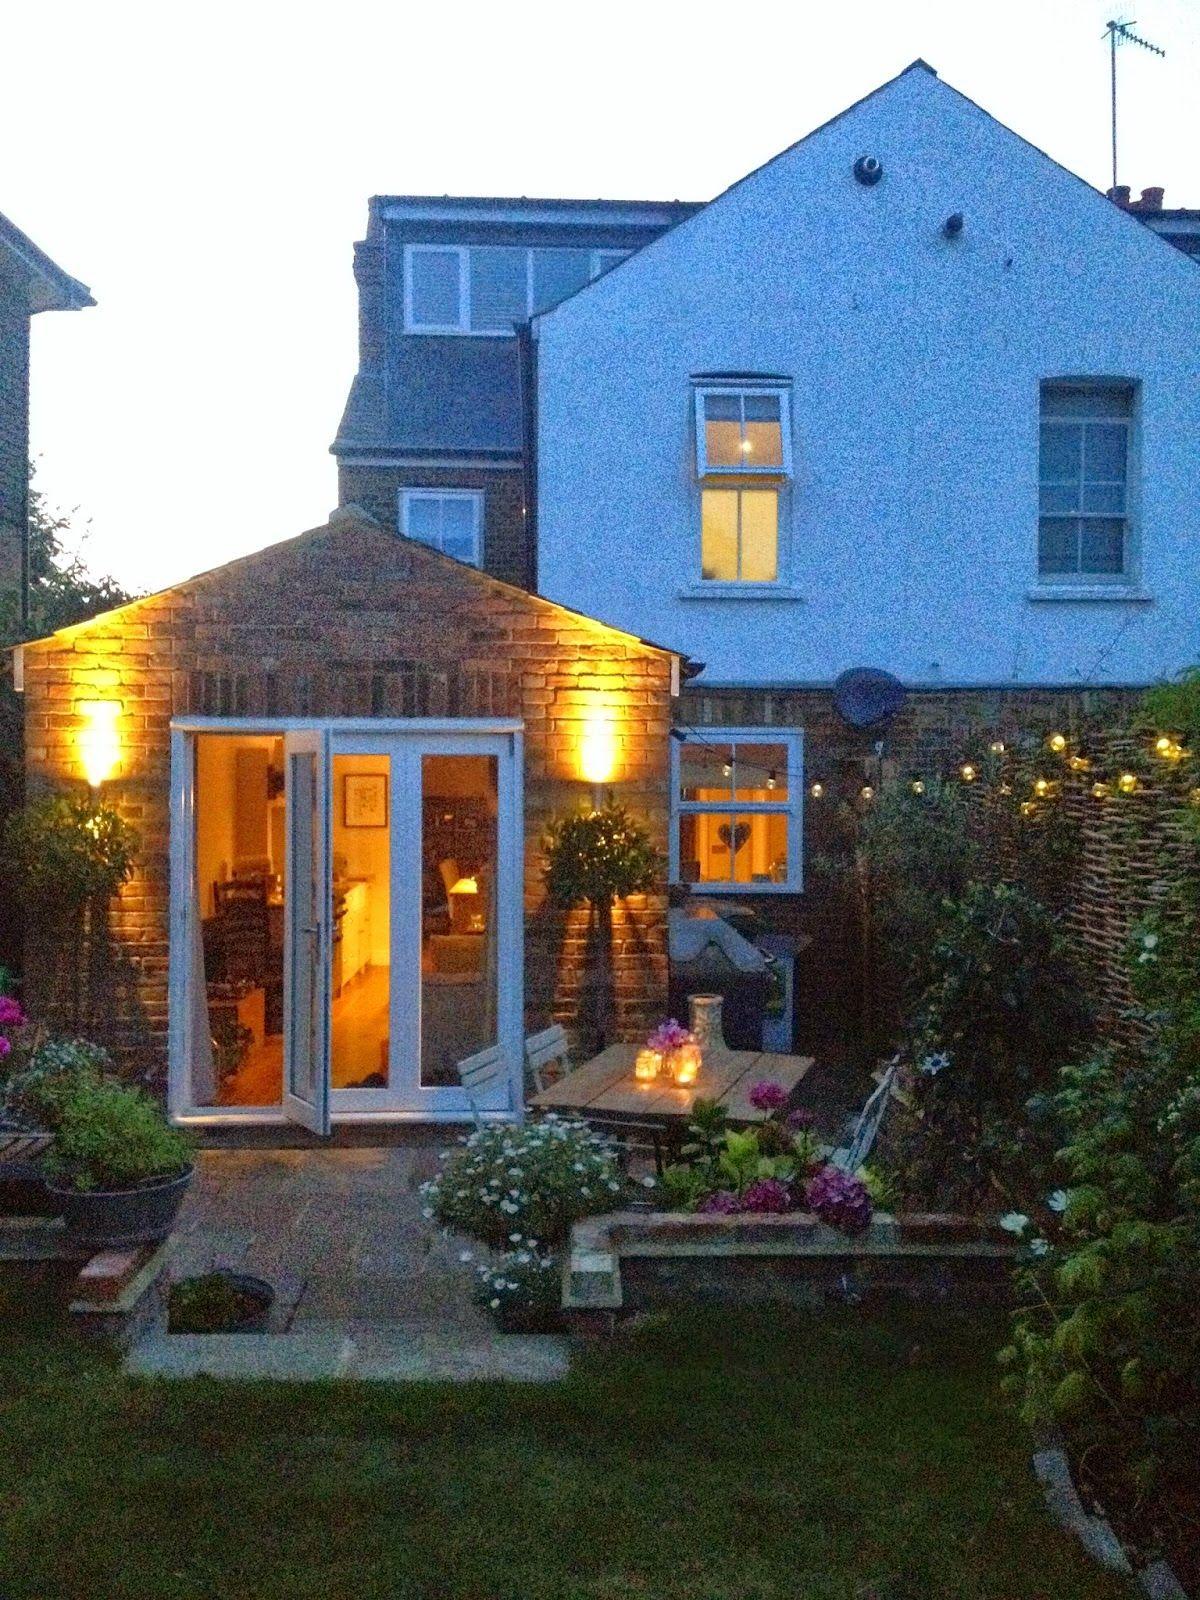 English Cottage Garden Victorian Terrace Garden Courtyard Bistro Lights Terrace Garden Victorian Terrace Cottage Garden English terraced house backyard ideas